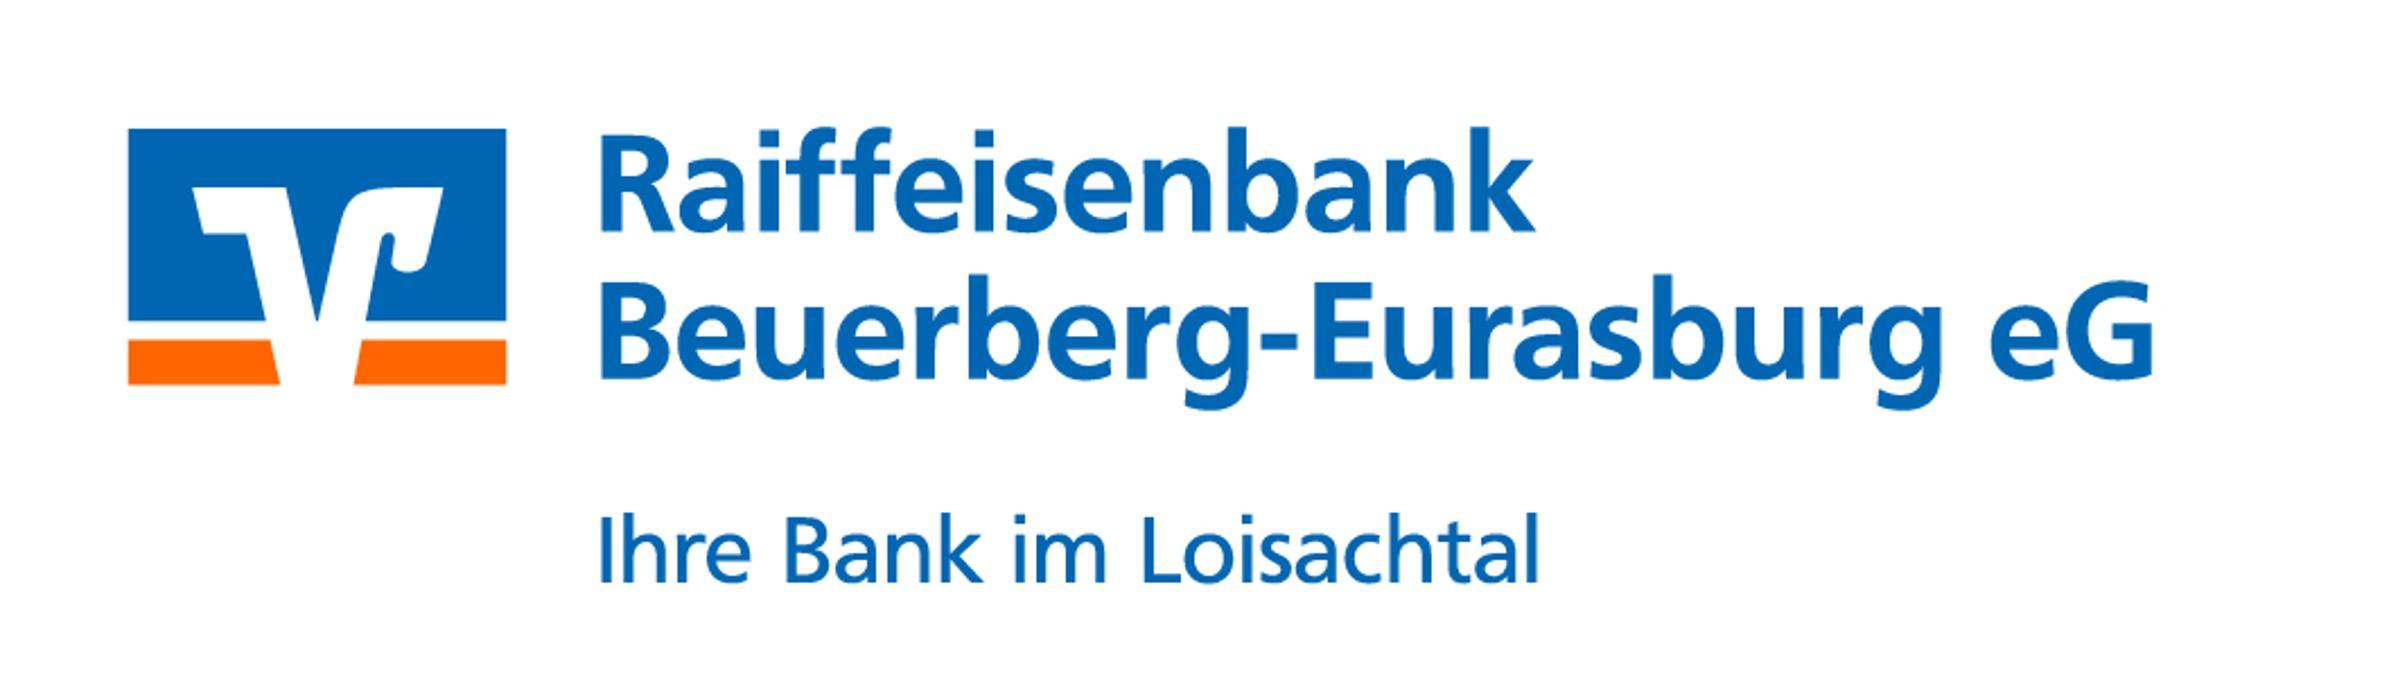 Logo von Raiffeisenbank Beuerberg-Eurasburg eG / Hauptstelle Beuerberg